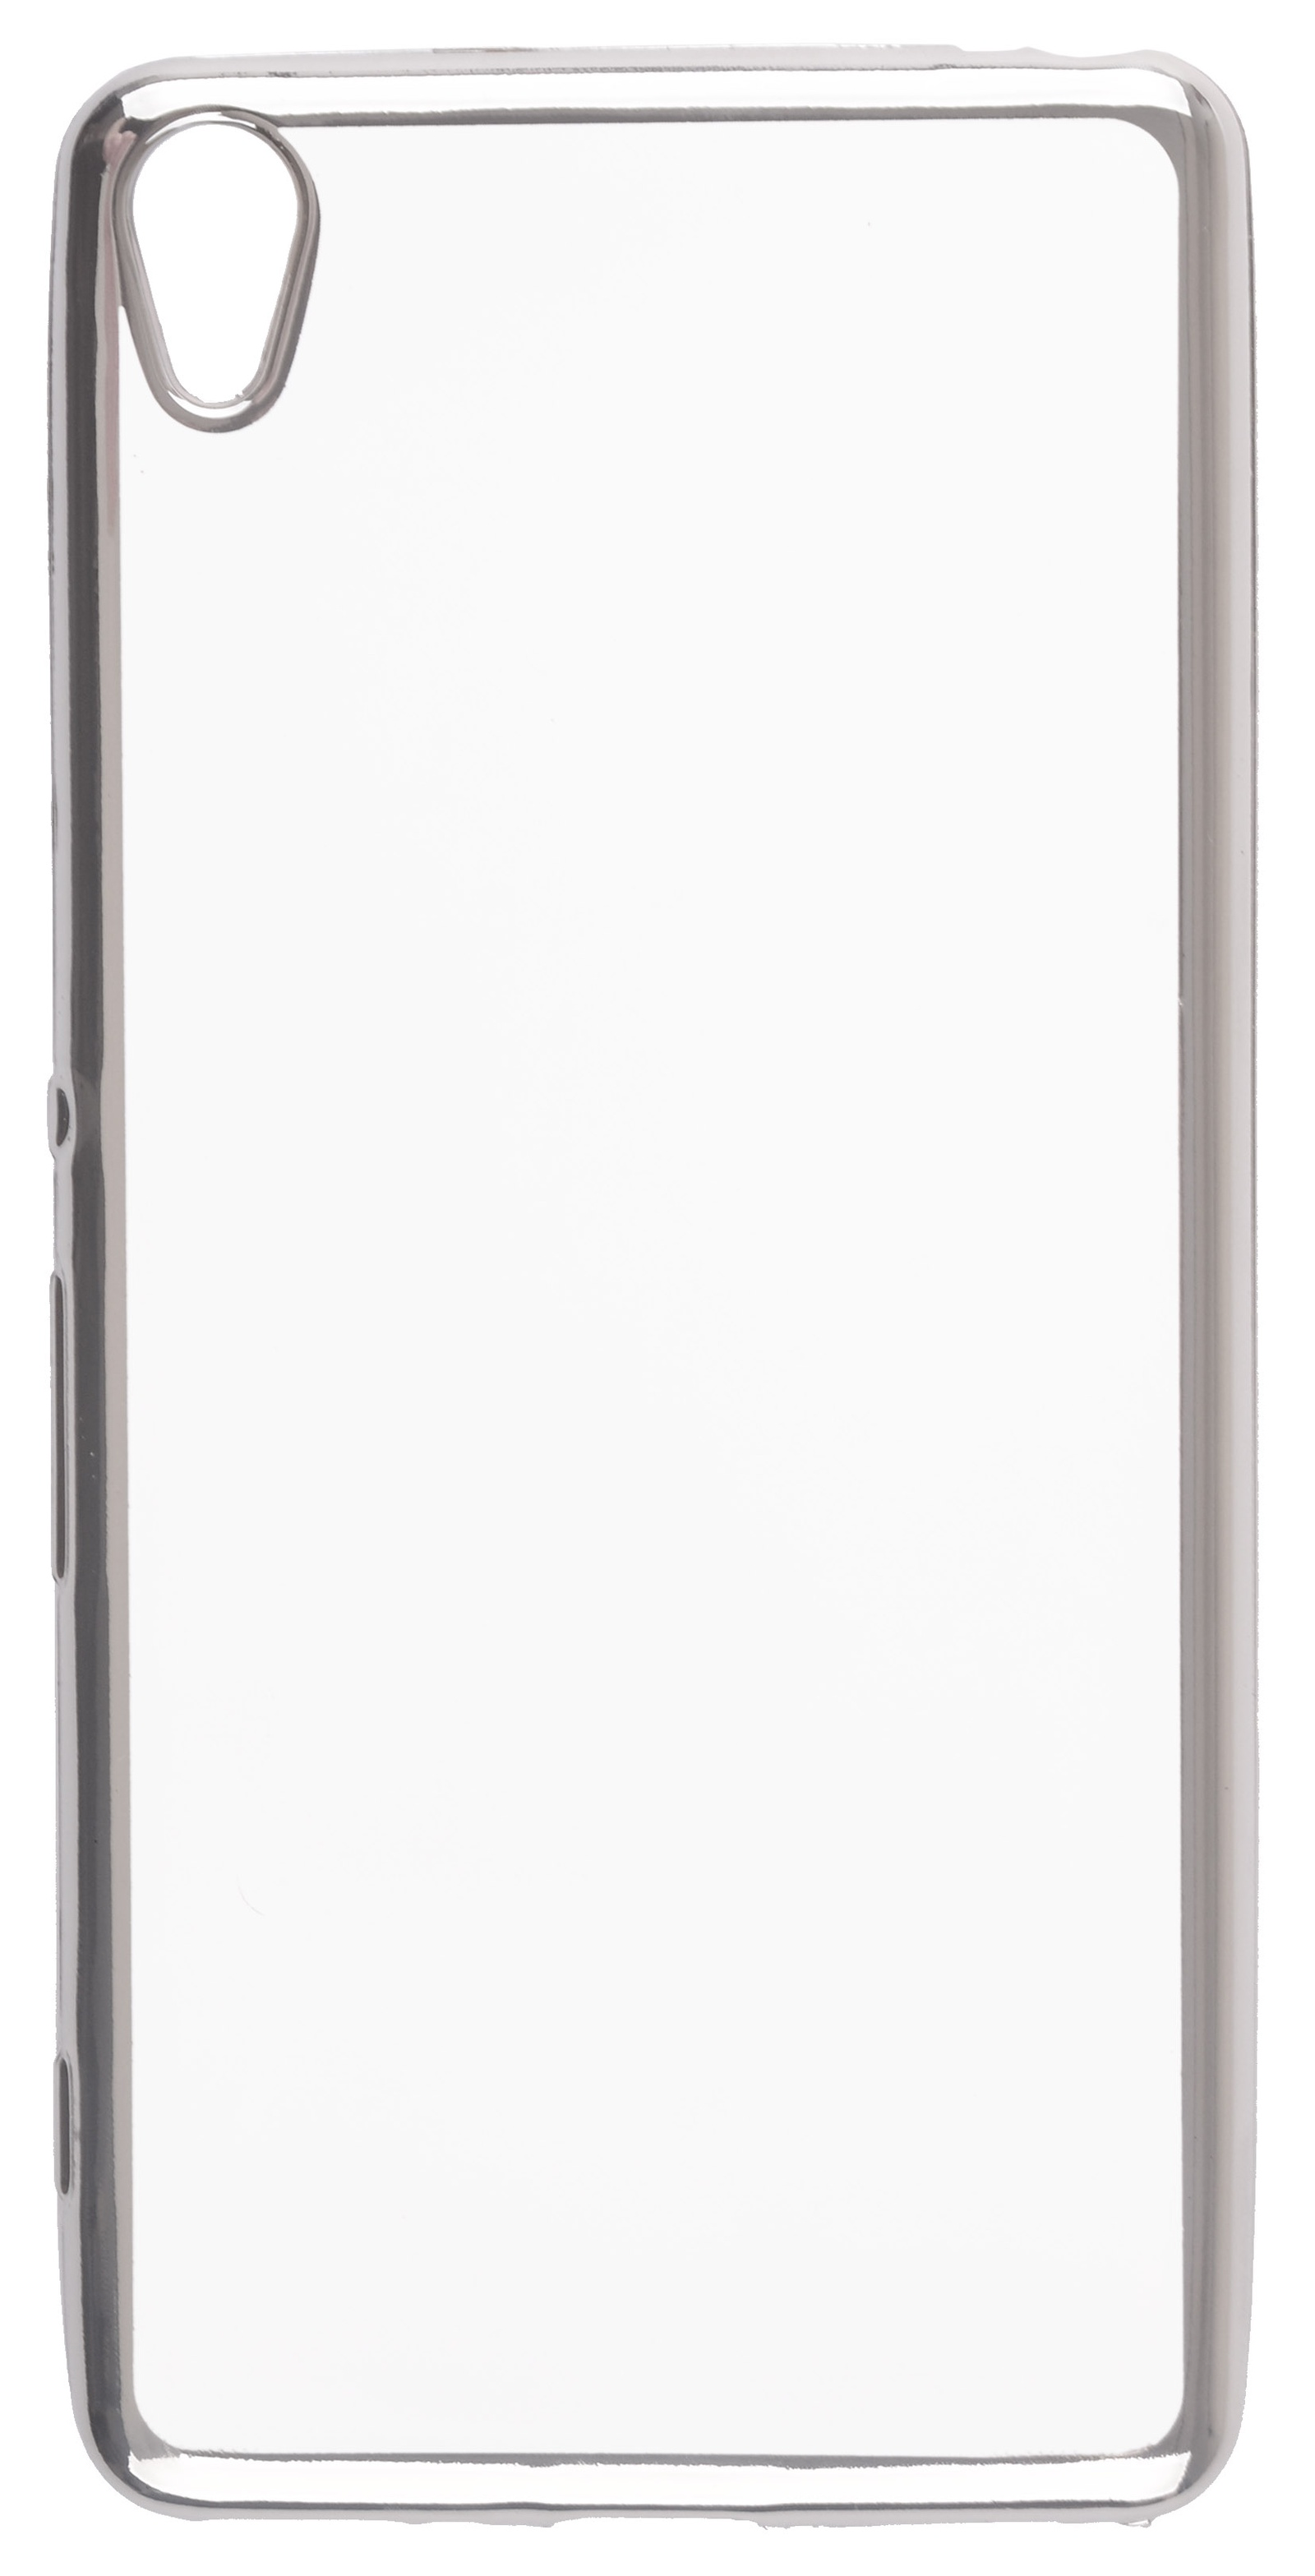 Чехол для сотового телефона skinBOX Silicone chrome border, 4630042528741, серебристый чехол для сотового телефона skinbox silicone chrome border 4630042524514 серебристый